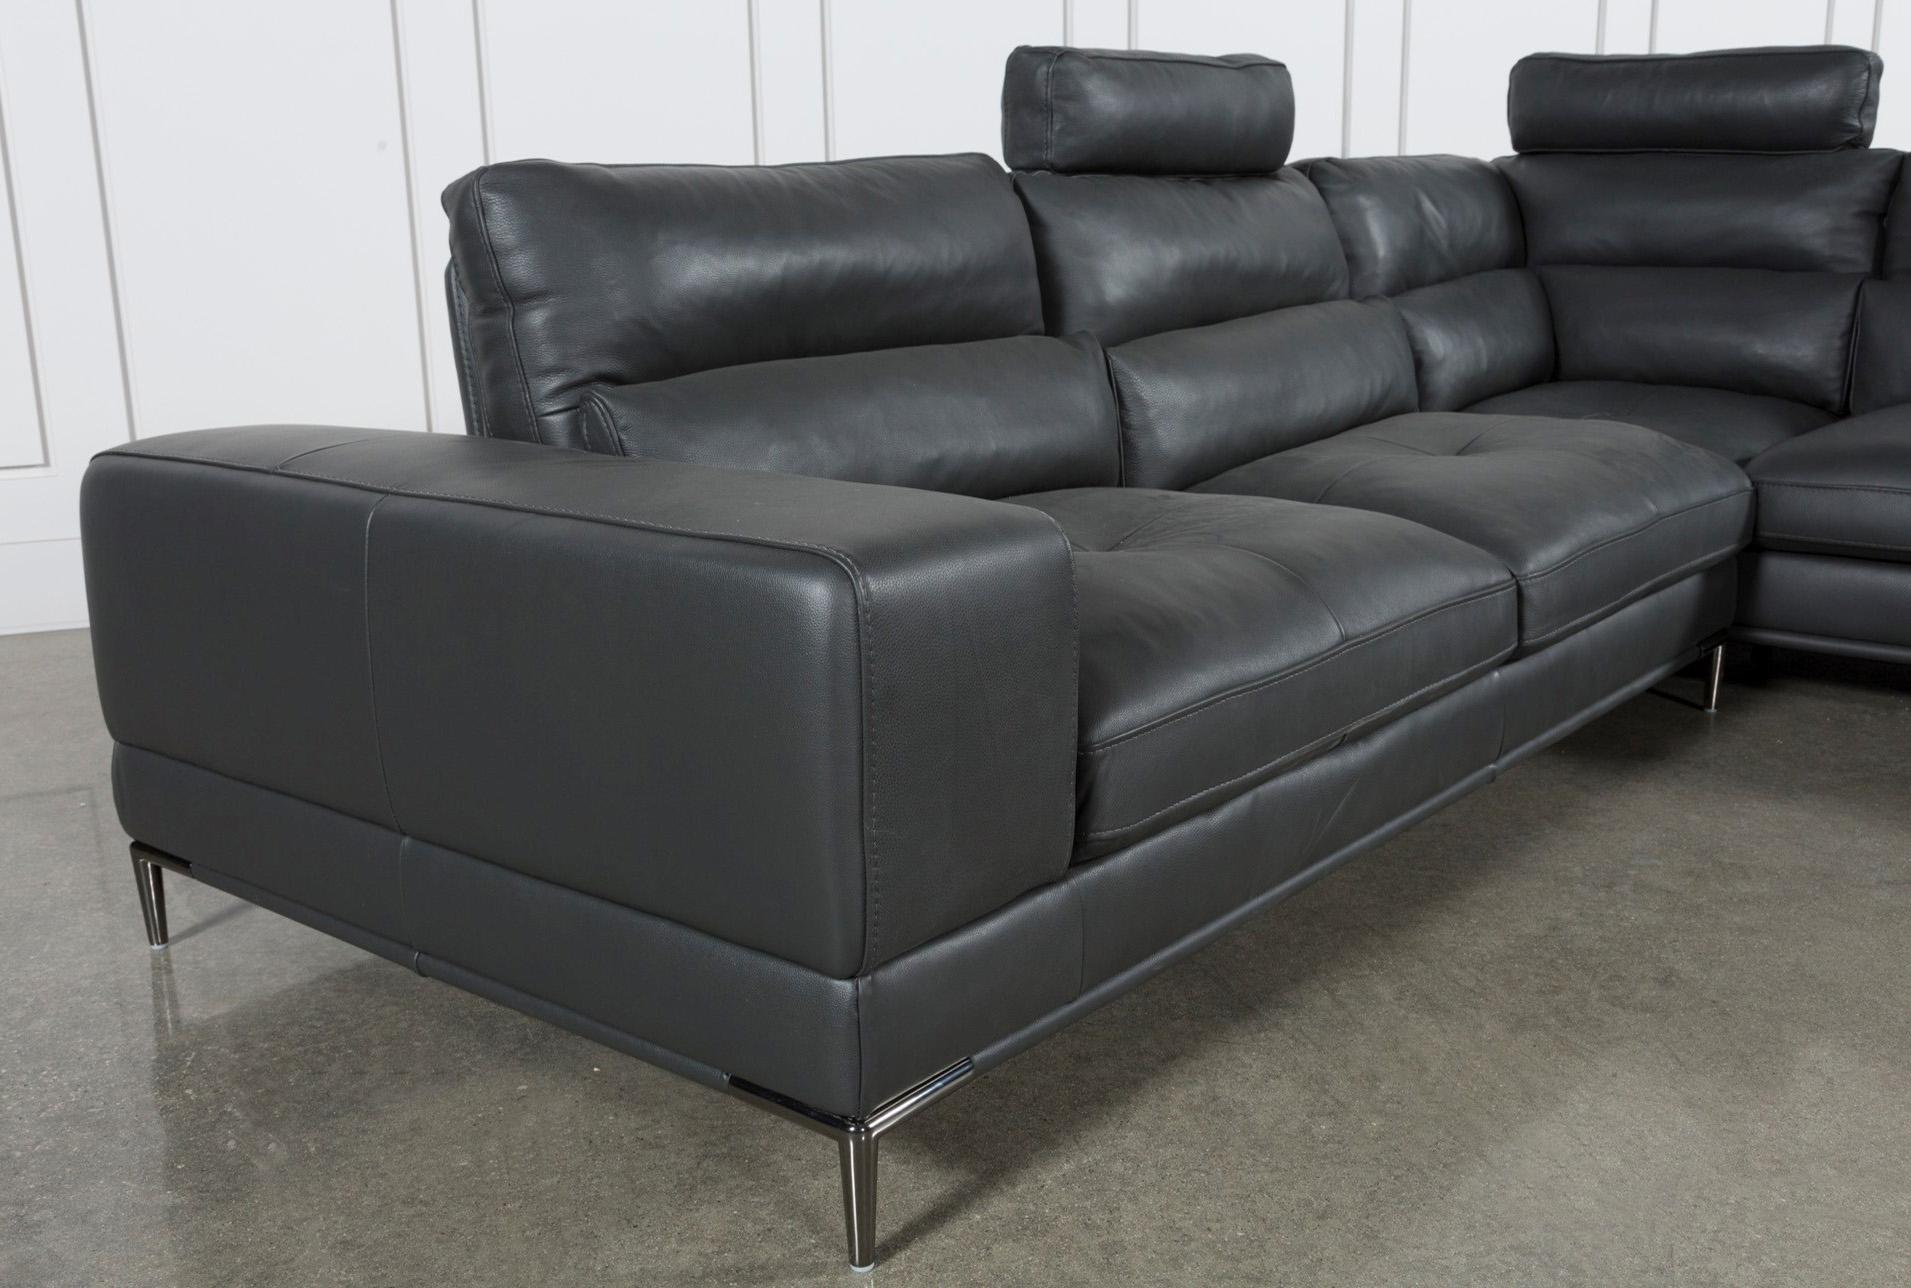 Tenny Dark Grey 2 Piece Right Facing Chaise Sectional W/2 Headrest With Tenny Dark Grey 2 Piece Right Facing Chaise Sectionals With 2 Headrest (View 3 of 25)